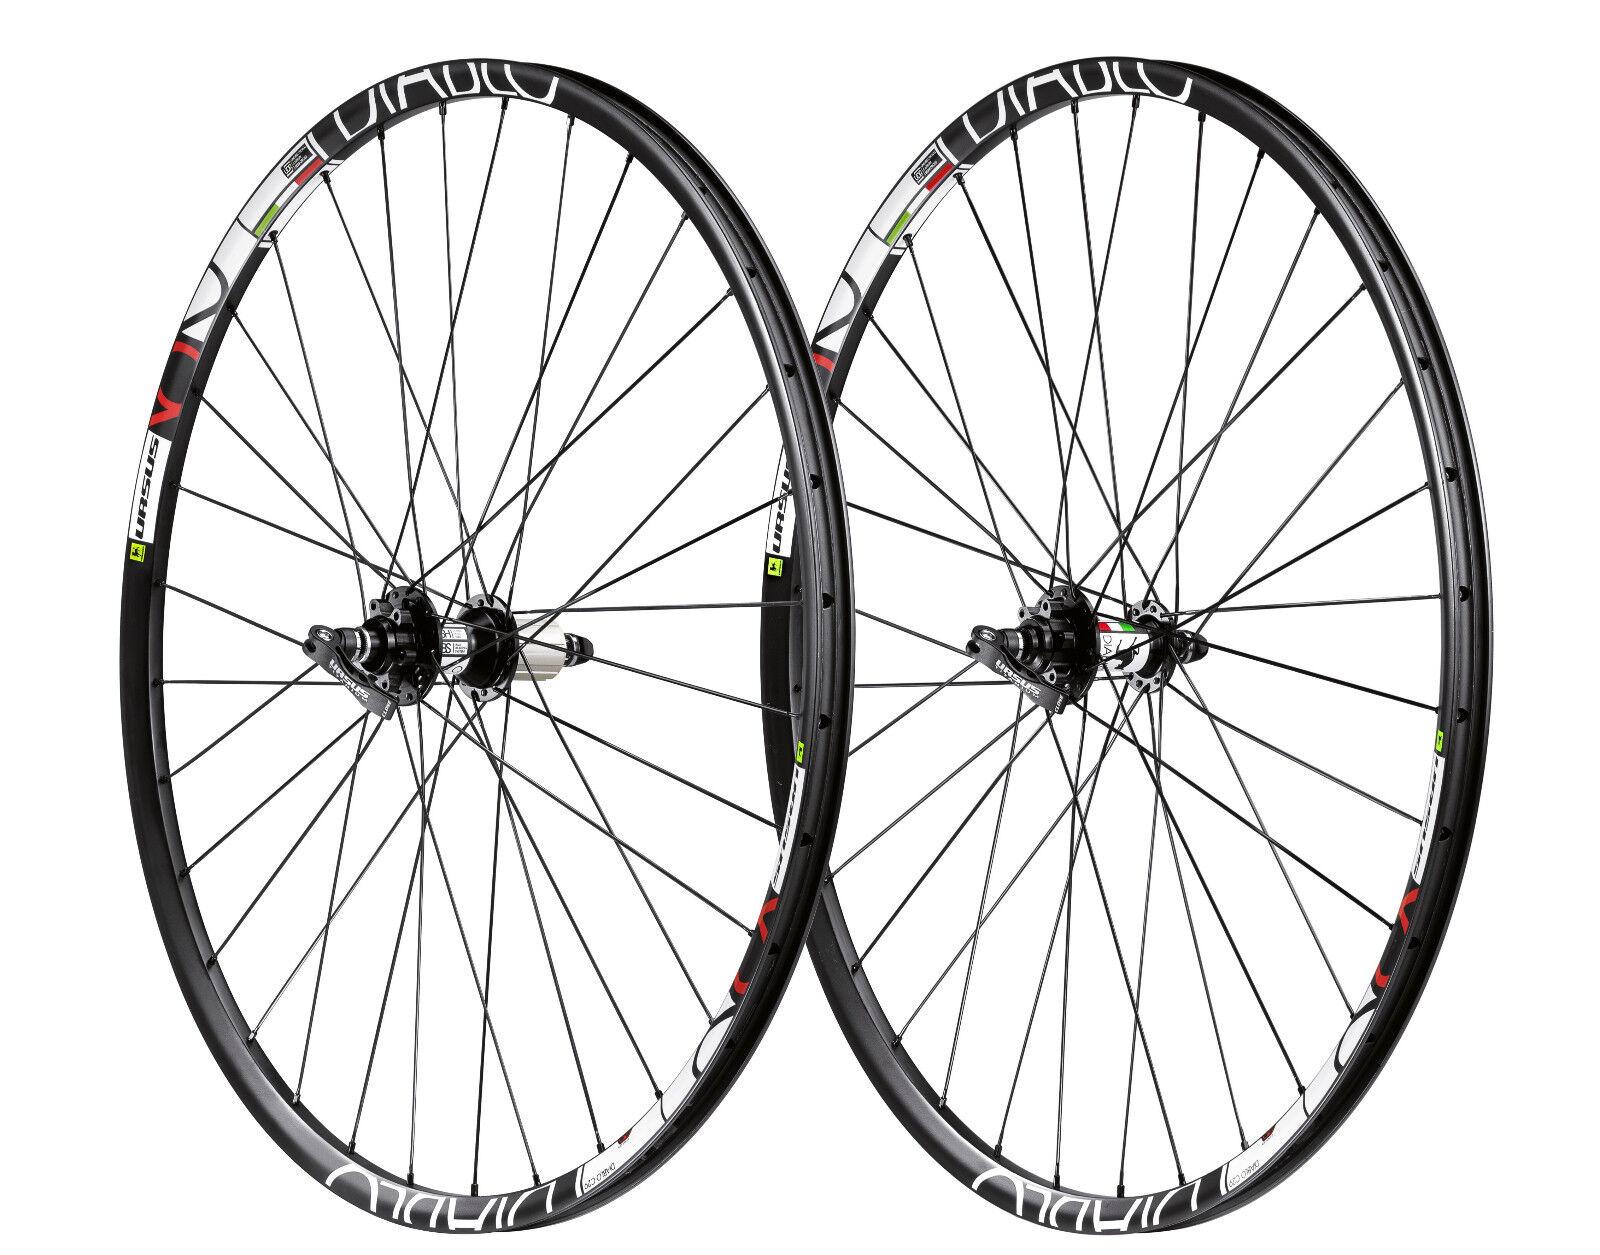 Ursus diablo MTB 29  High End carbon ruedas, peso 1475g